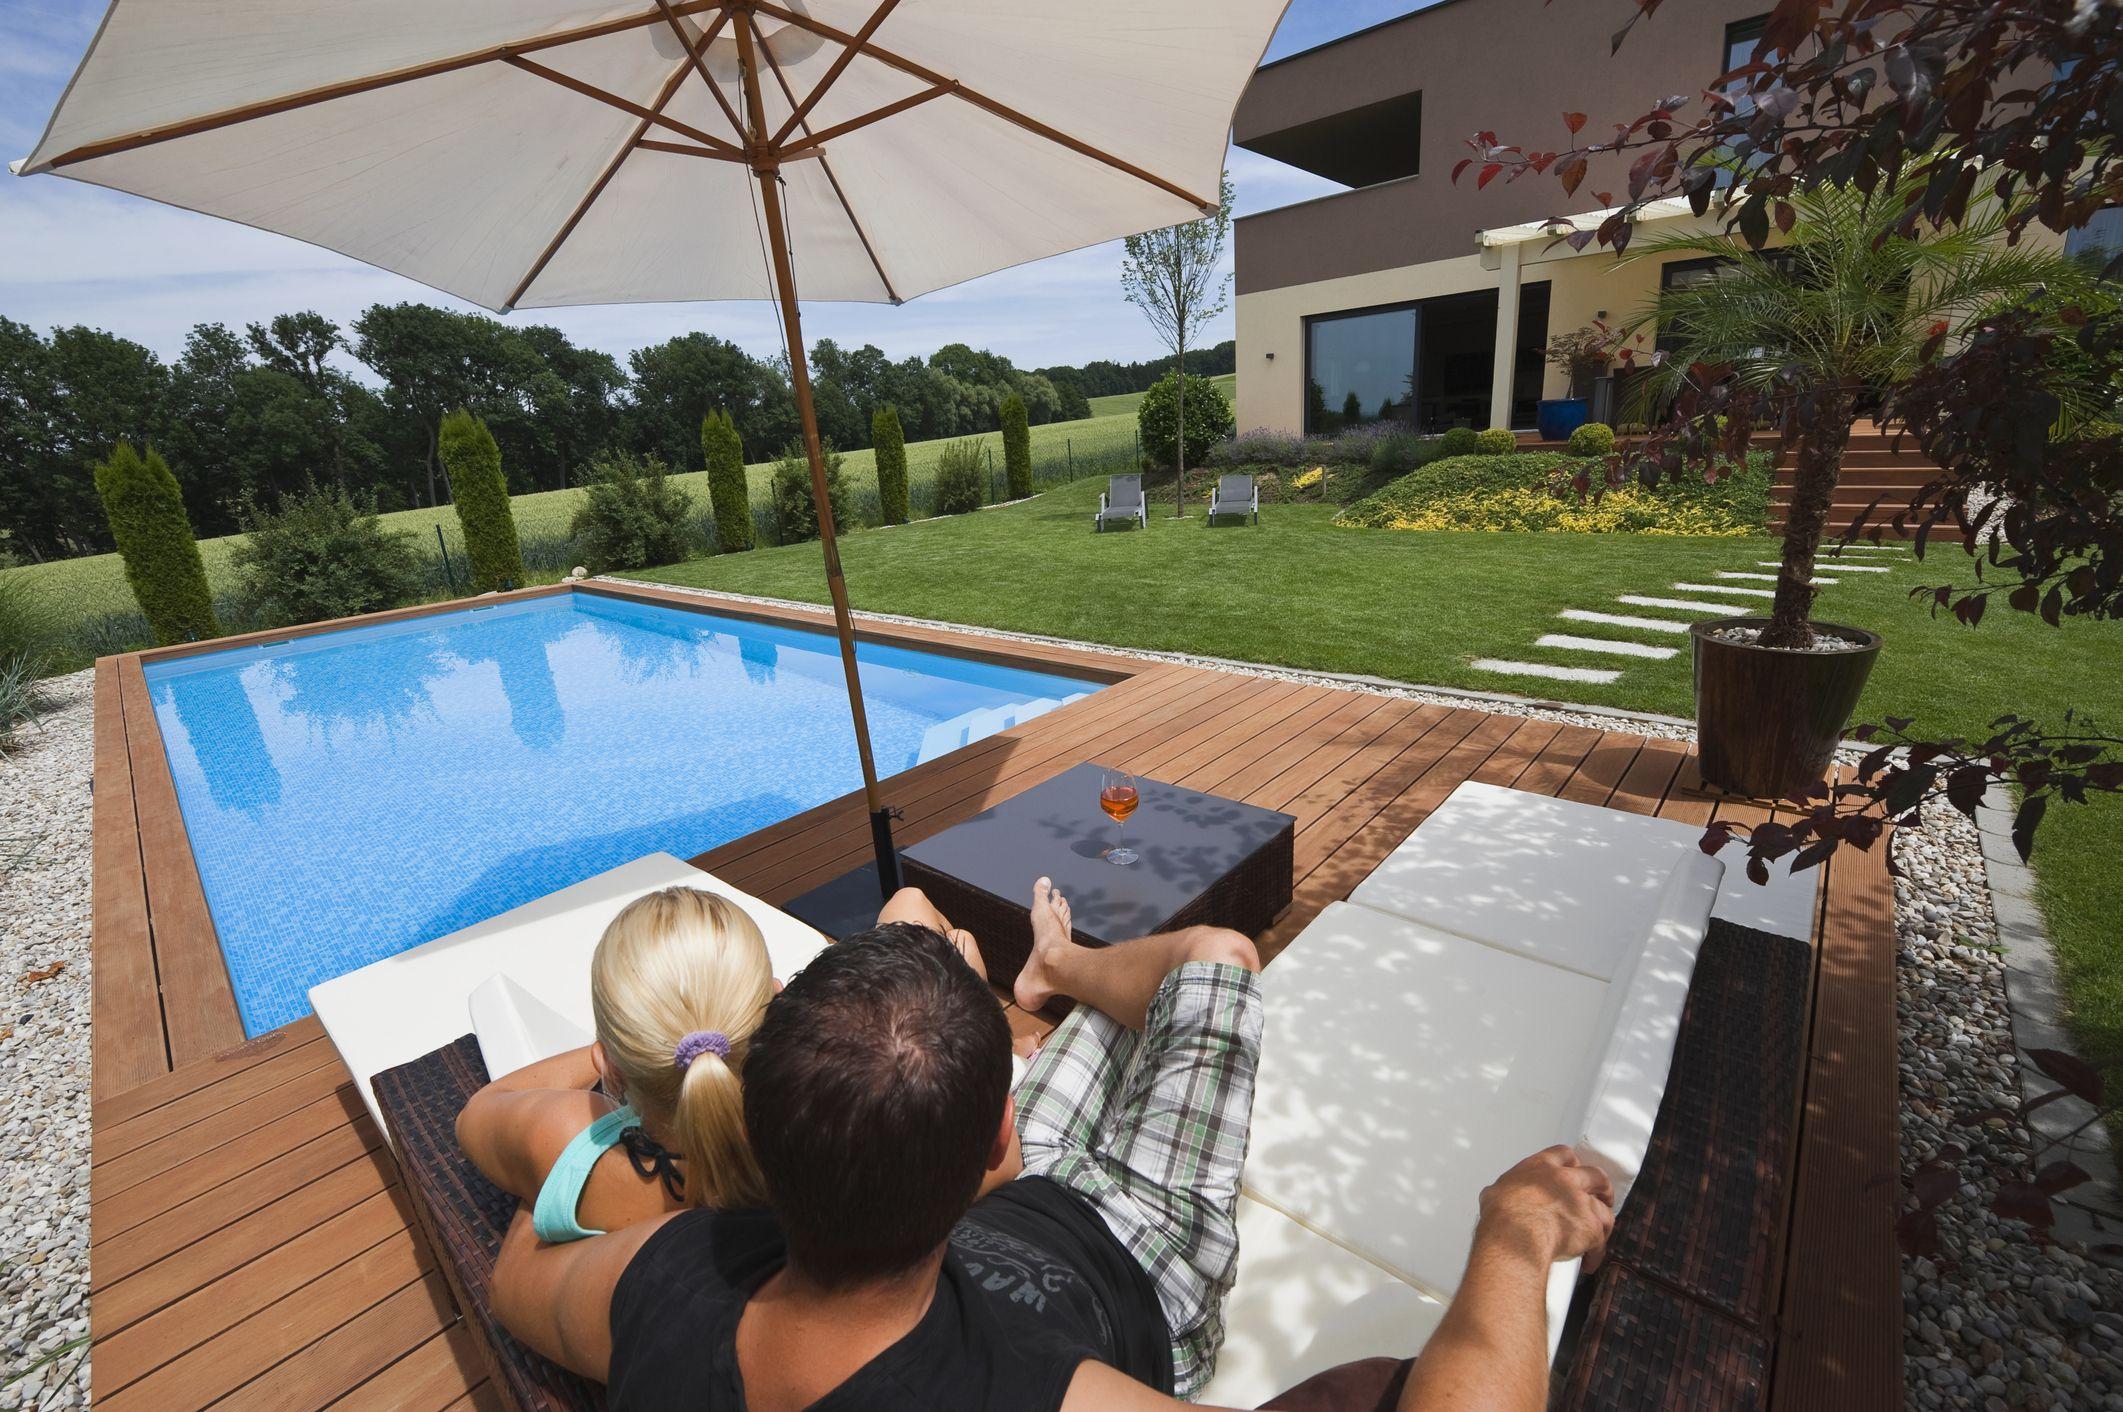 11 ways to create a more relaxing backyard